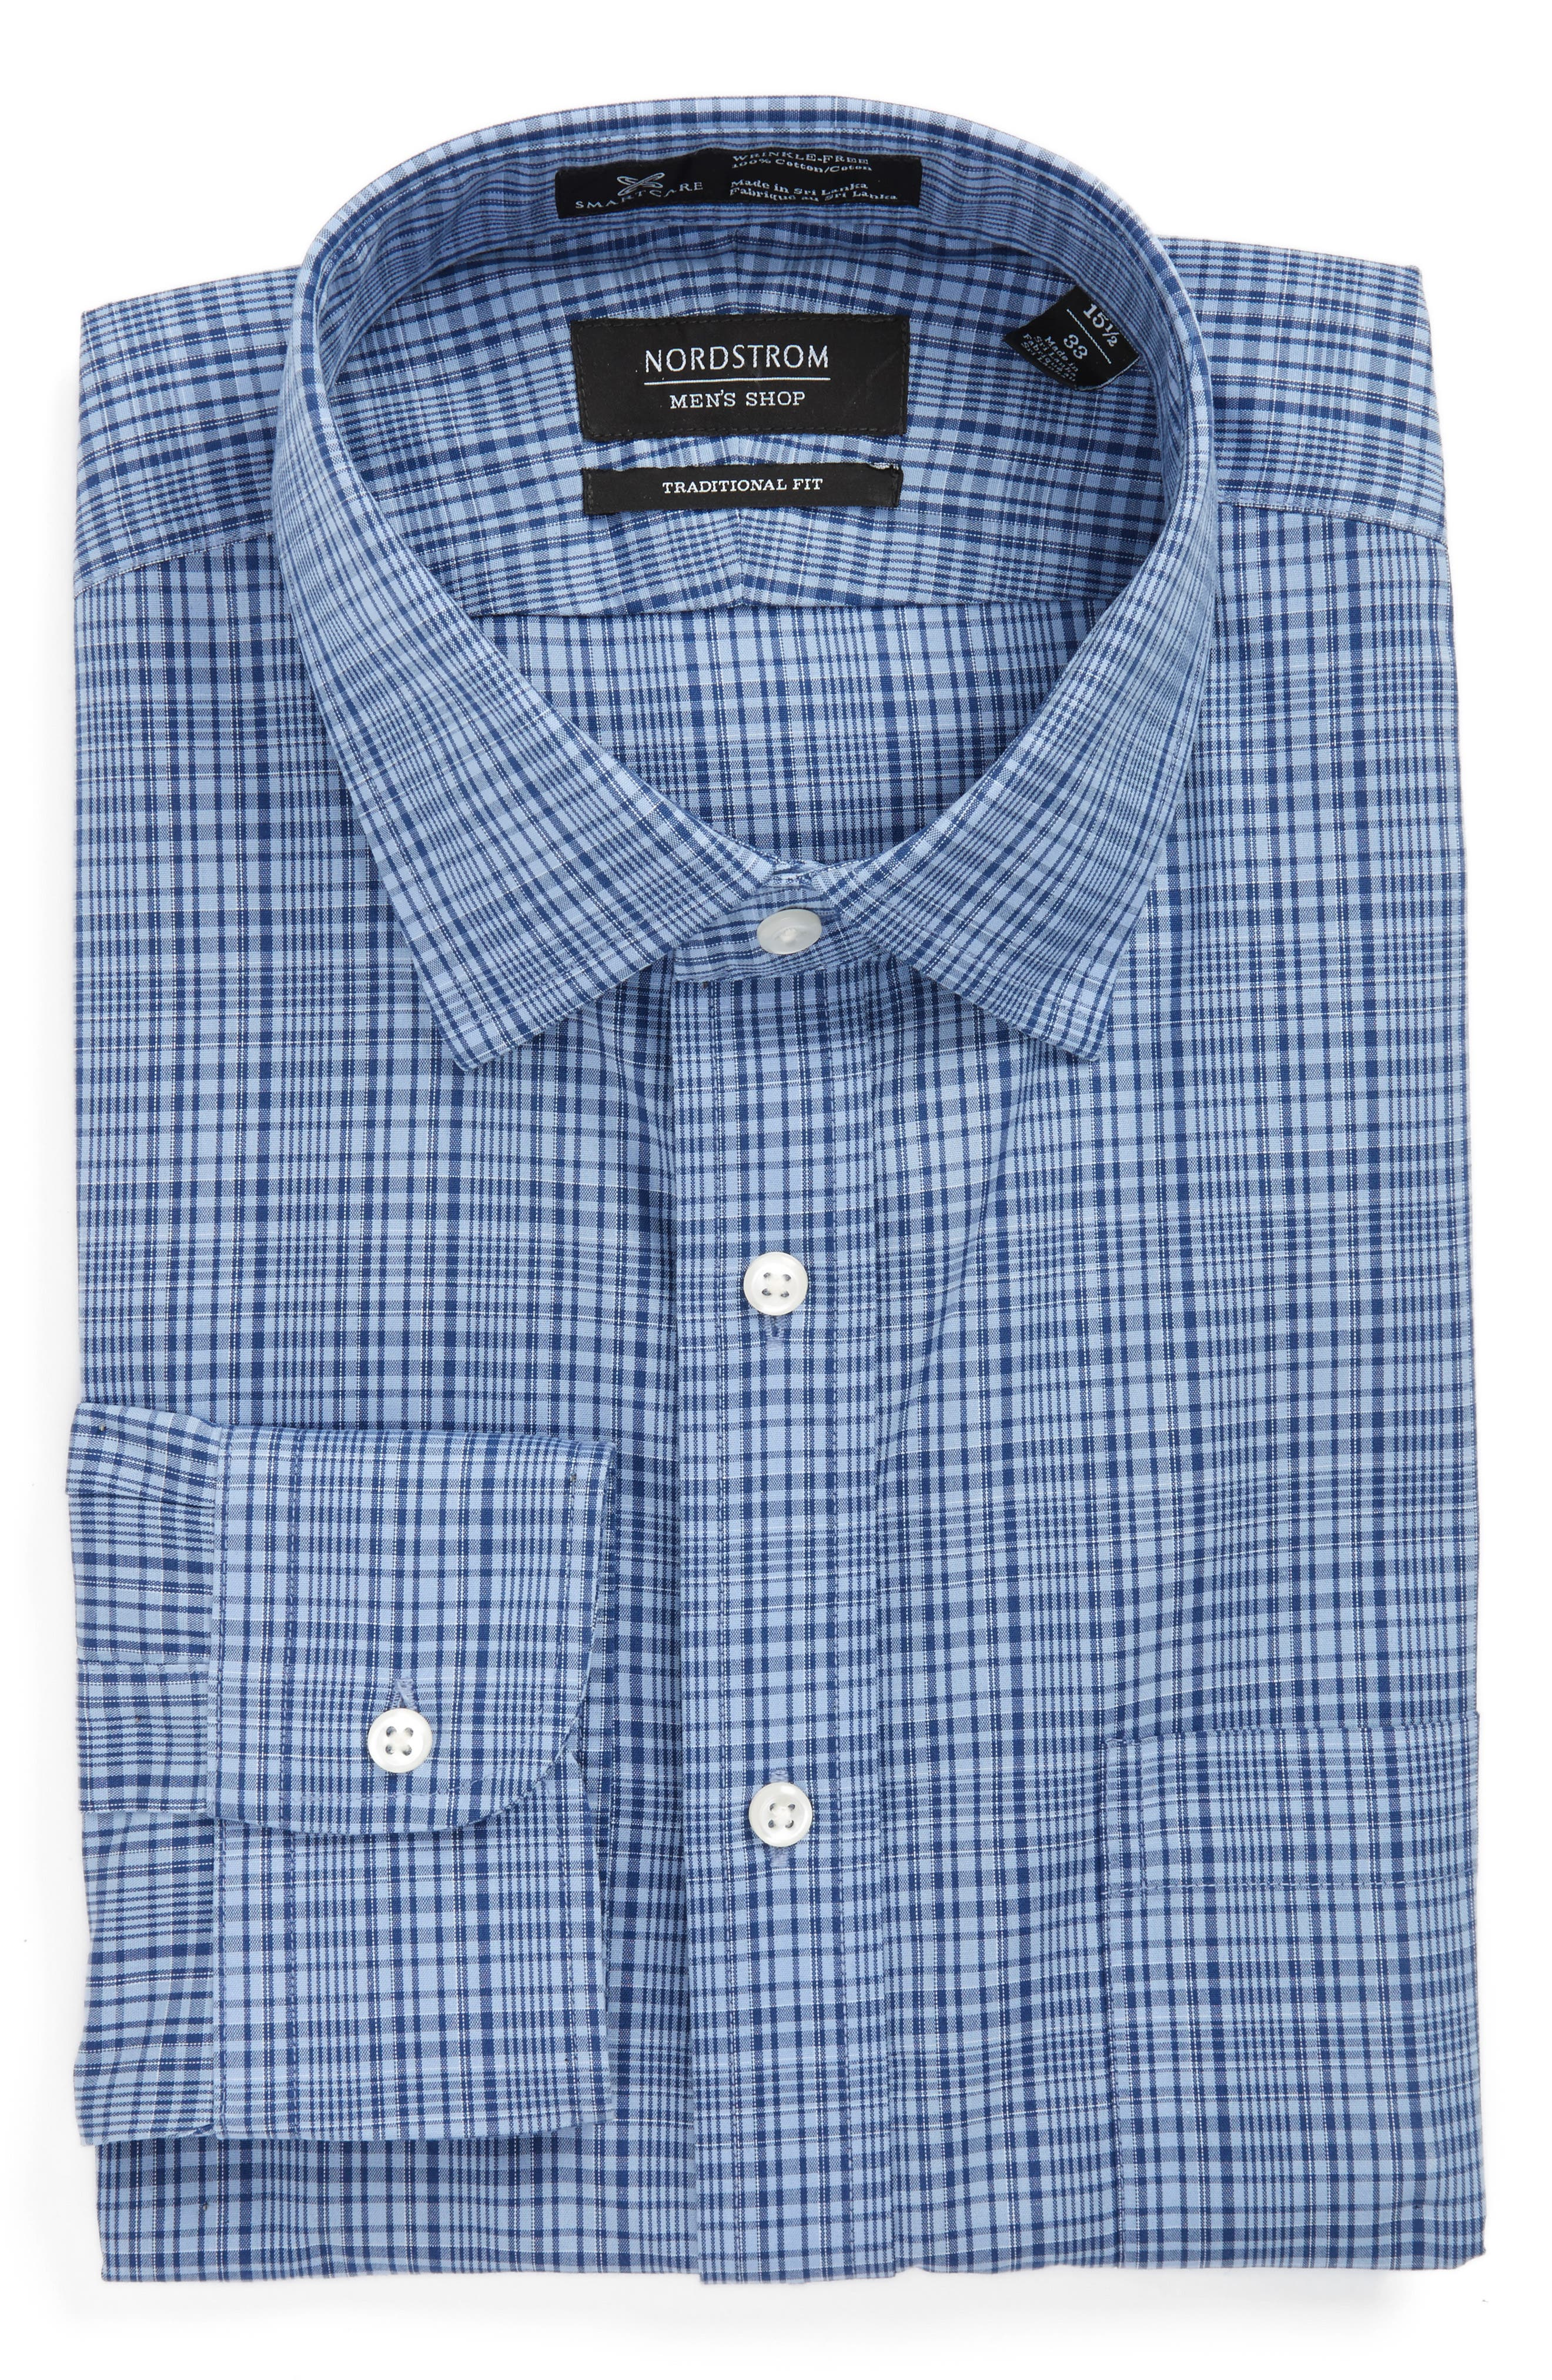 NORDSTROM MENS SHOP Smartcare<sup>™</sup> Traditional Fit Plaid Dress Shirt